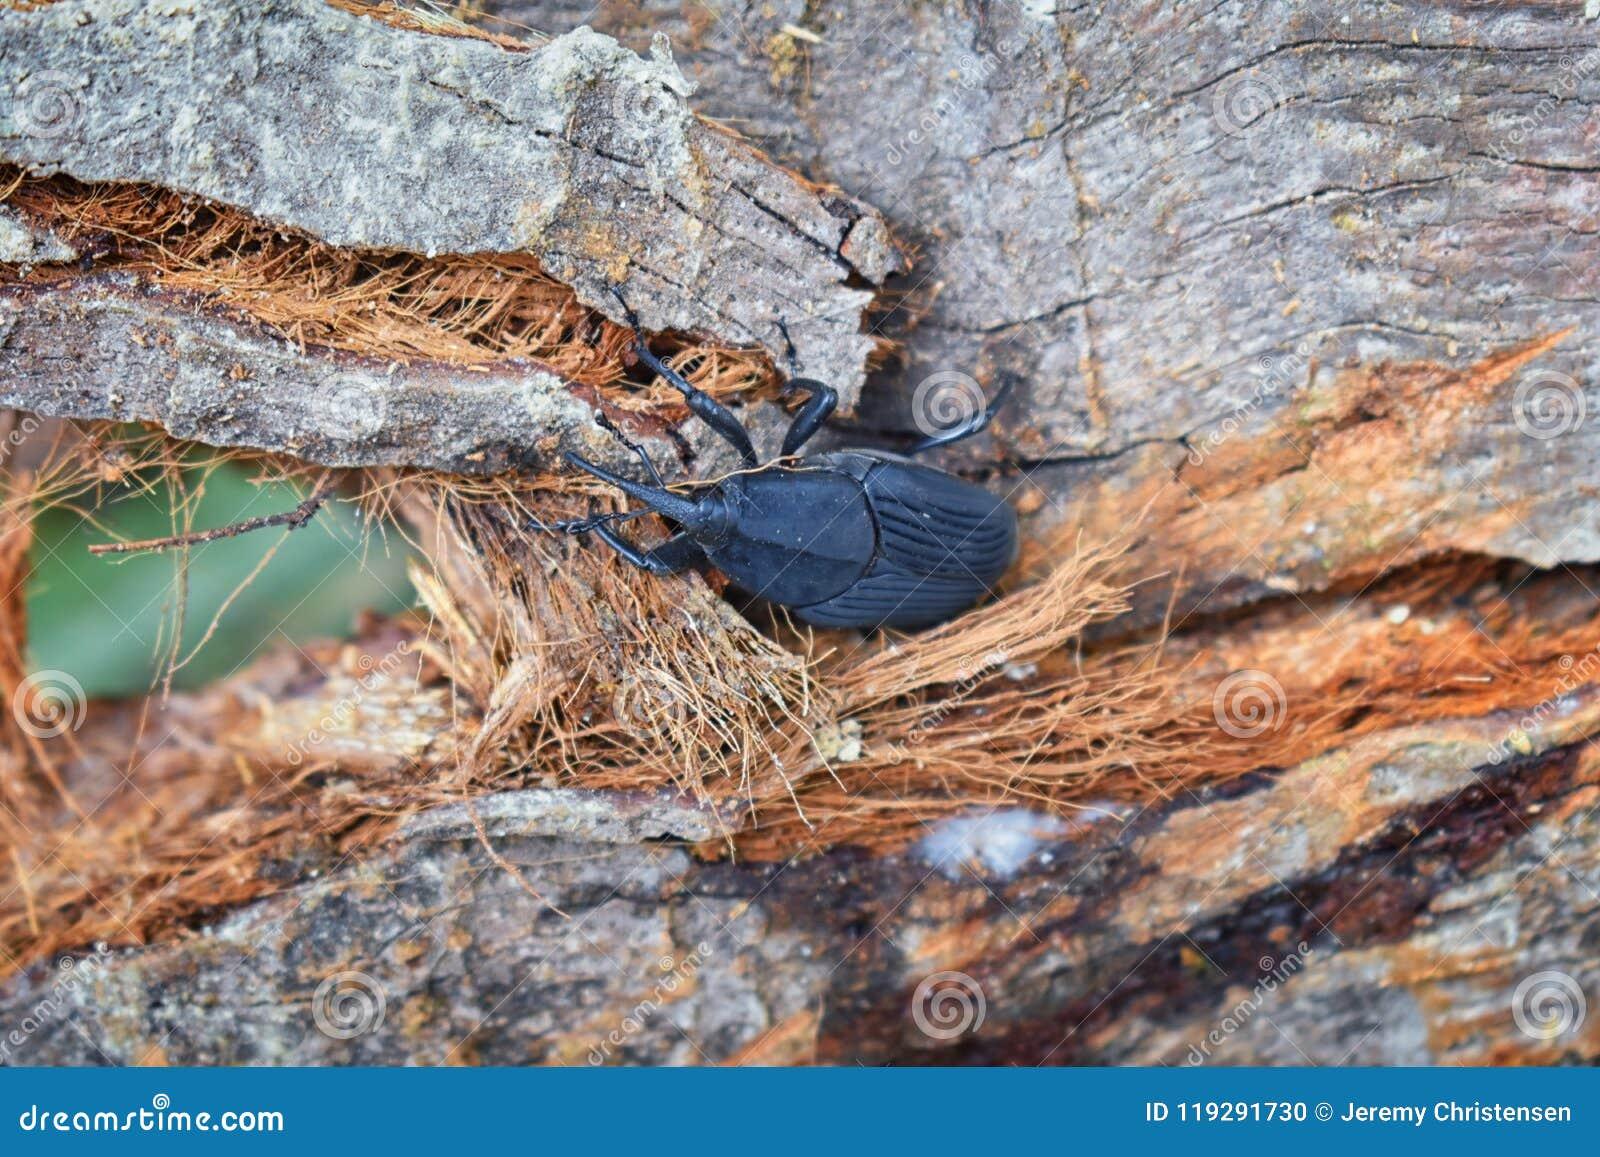 Big Black Beetle Crawling On Rotting Log In El Eden, Puerto